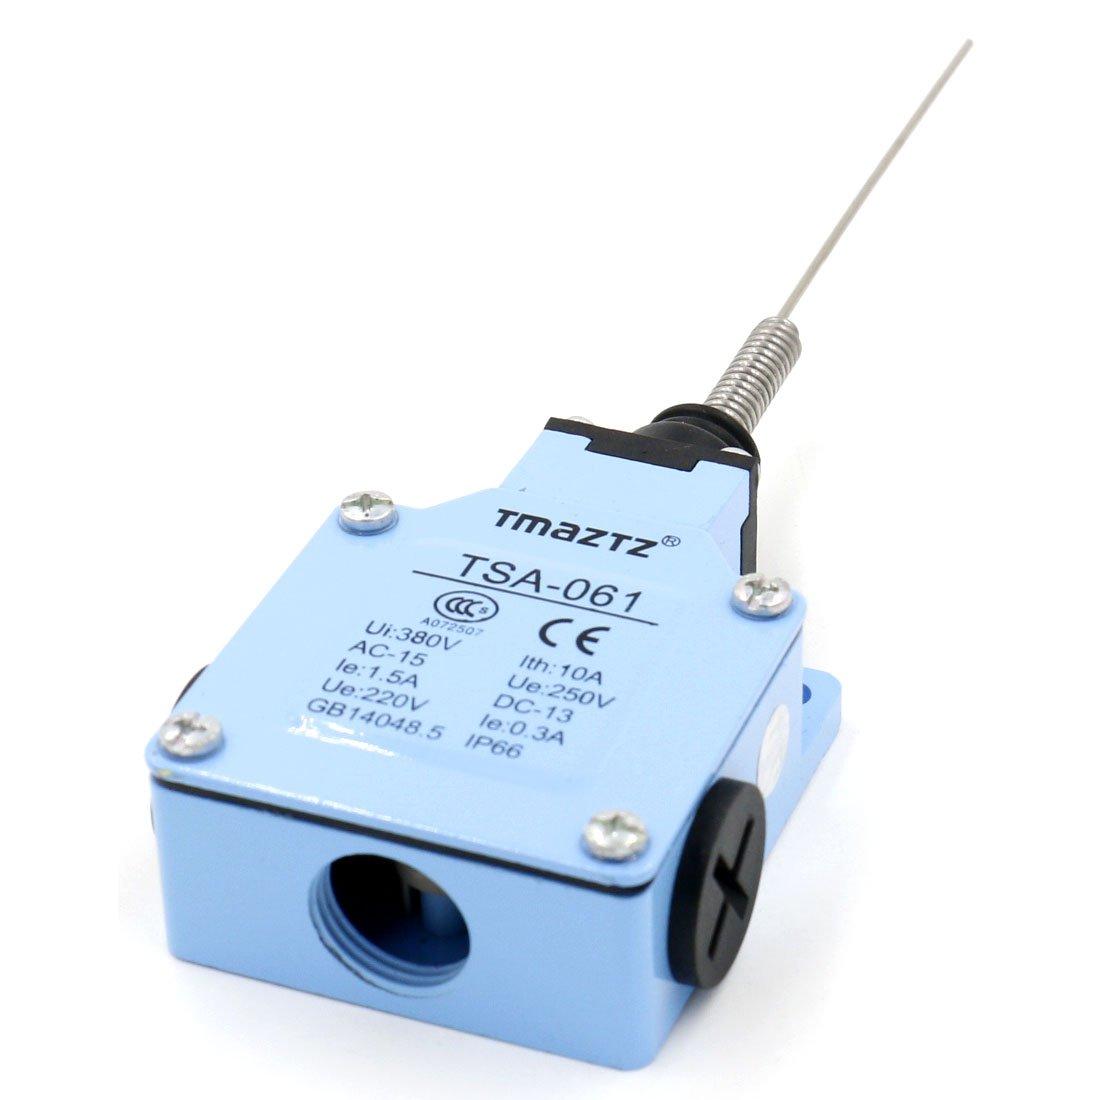 Baomain Limit switch TSA-061 Flexible Spring Arm 250V 15A 1NO, 1NC Momentory for CNC Lathe Milling